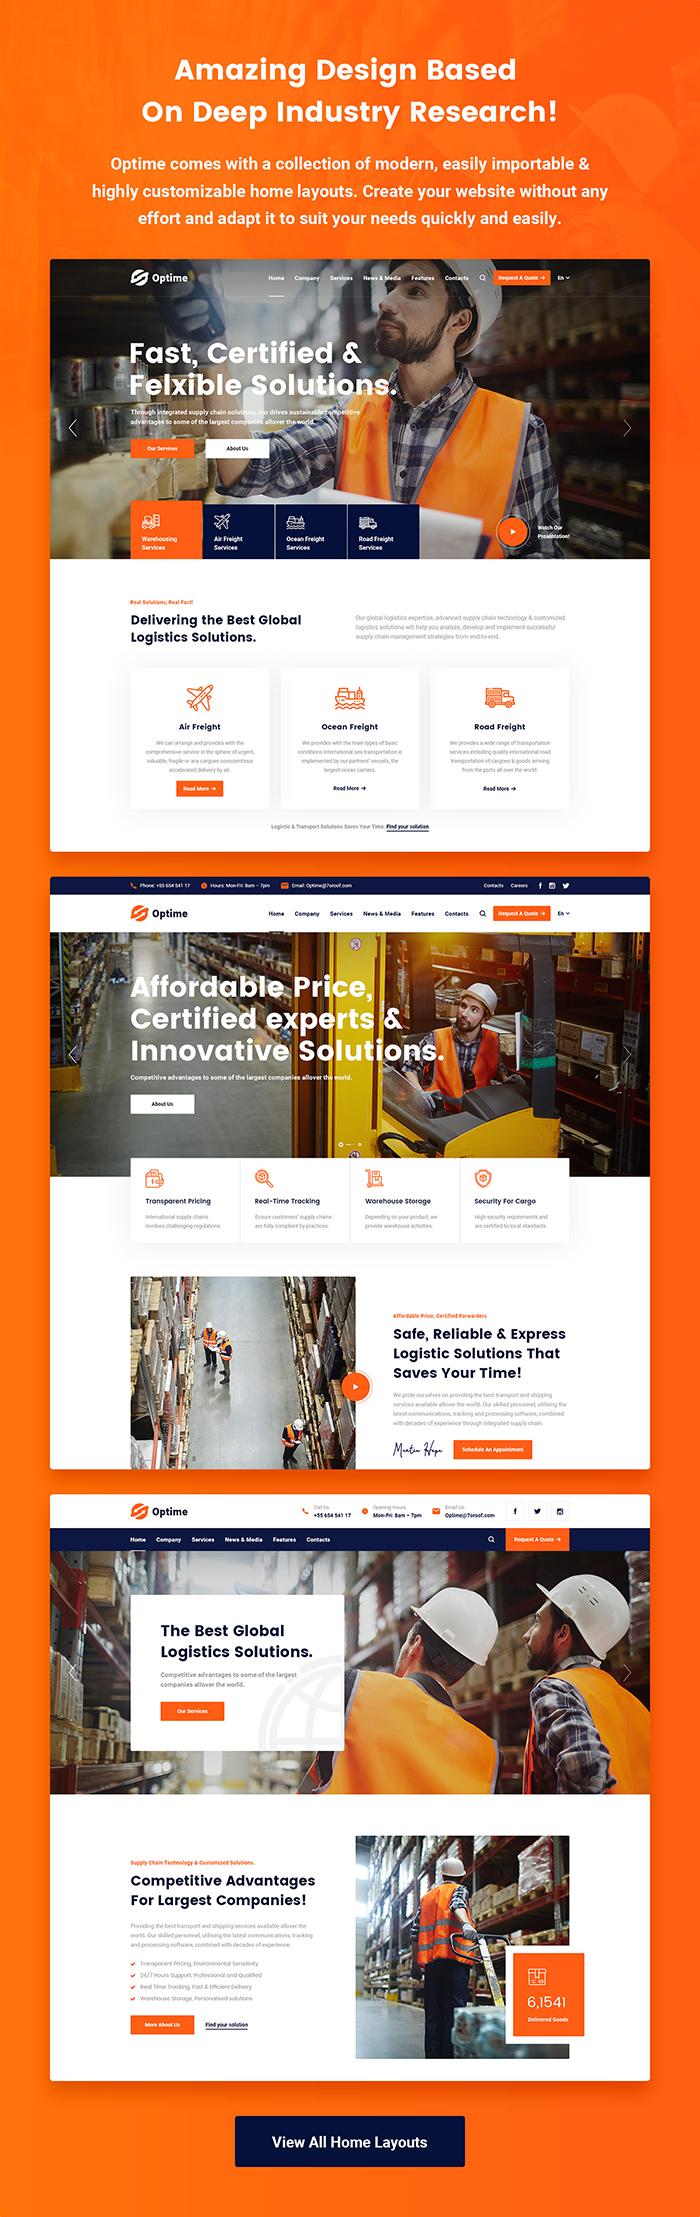 Optime - Logistik und Transport WordPress Theme - 5